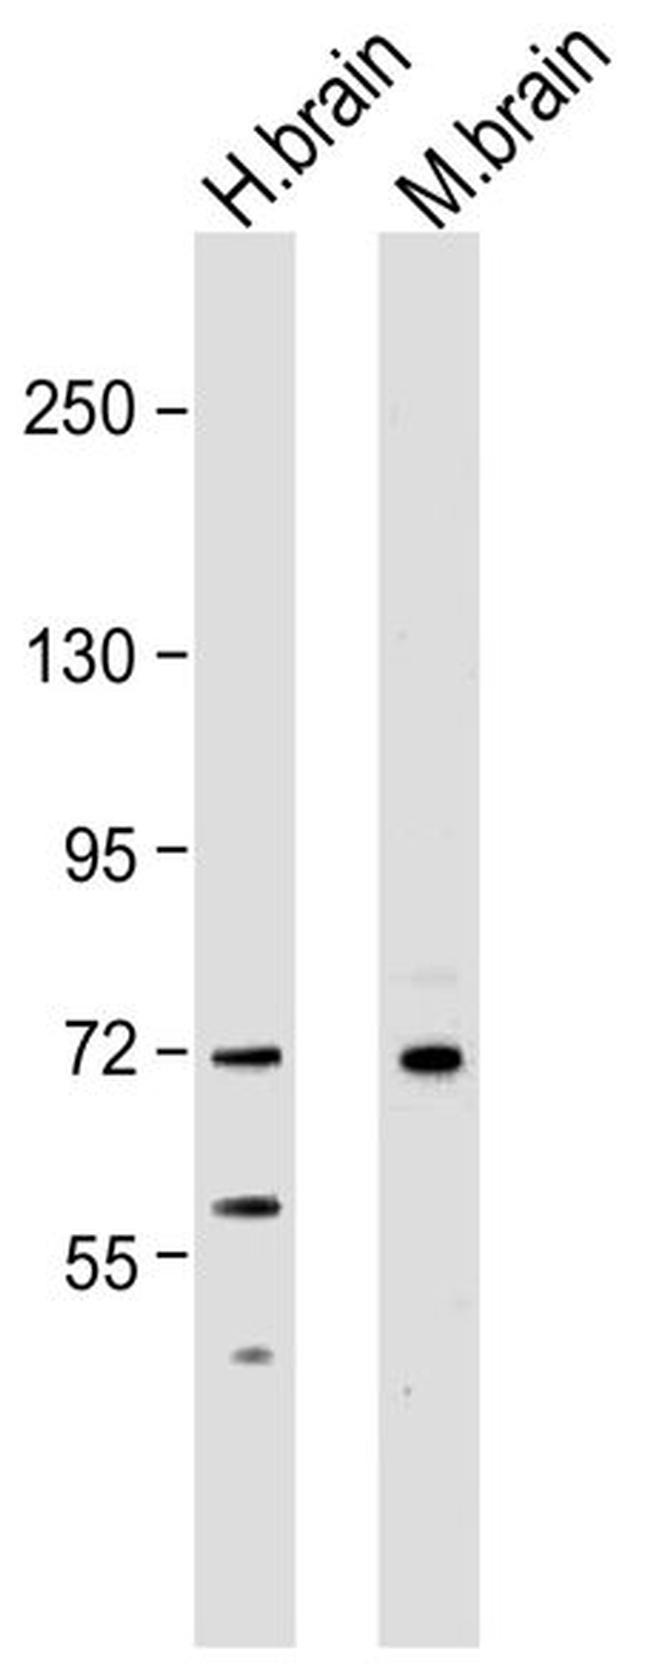 NEFL Antibody (13-0400) in Western Blot